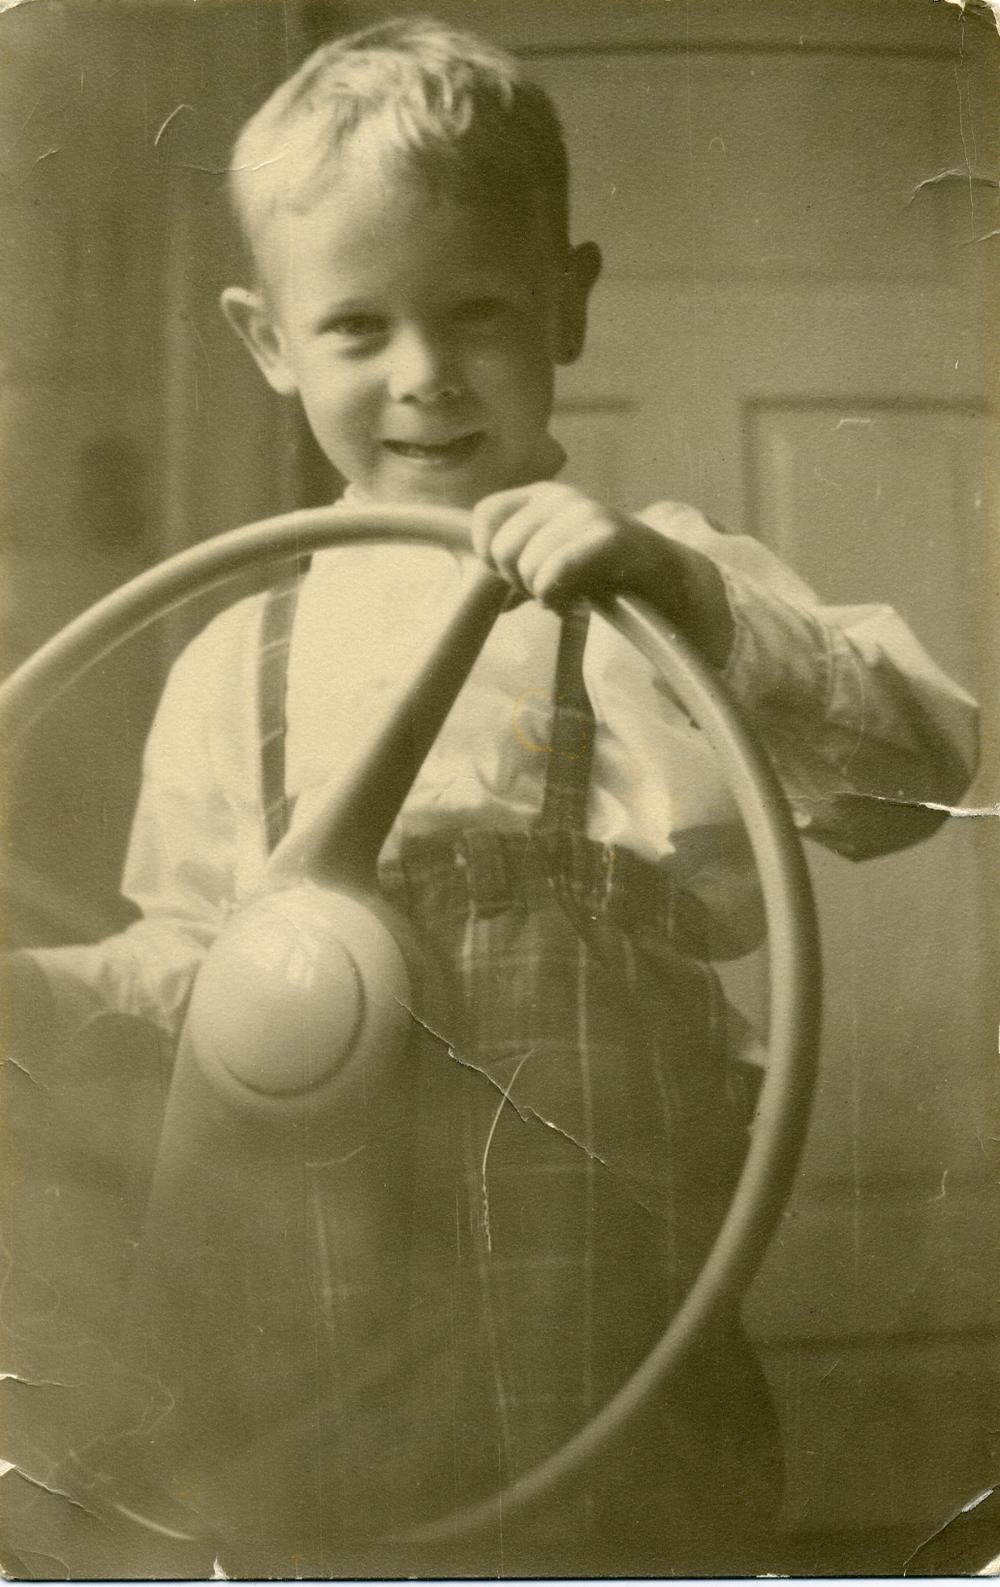 Young Markku